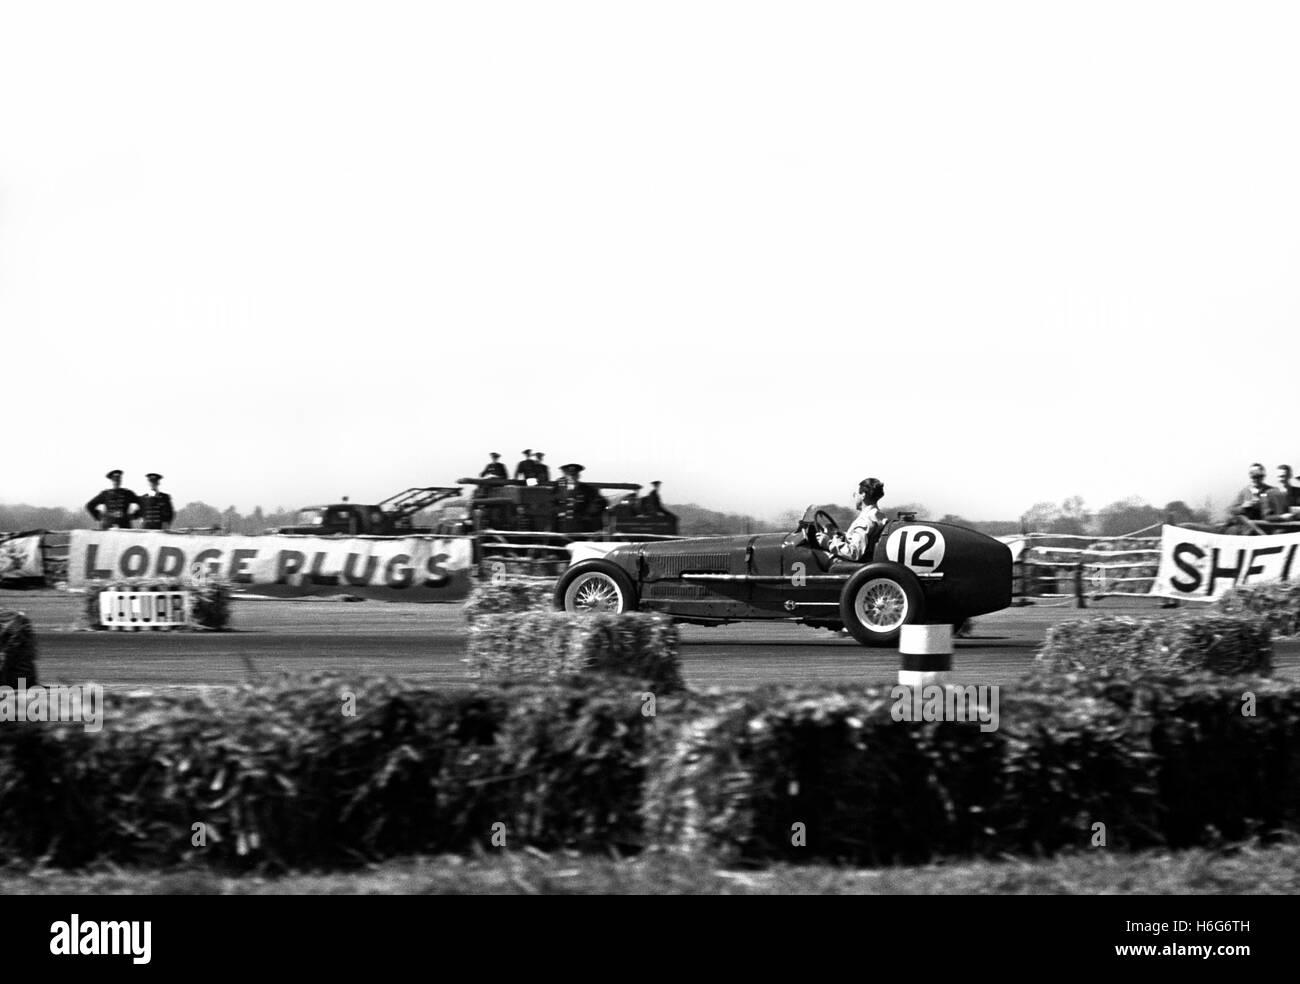 Gerard driving an ERA, 6th place at the British GP at Silverstone 1950 - Stock Image